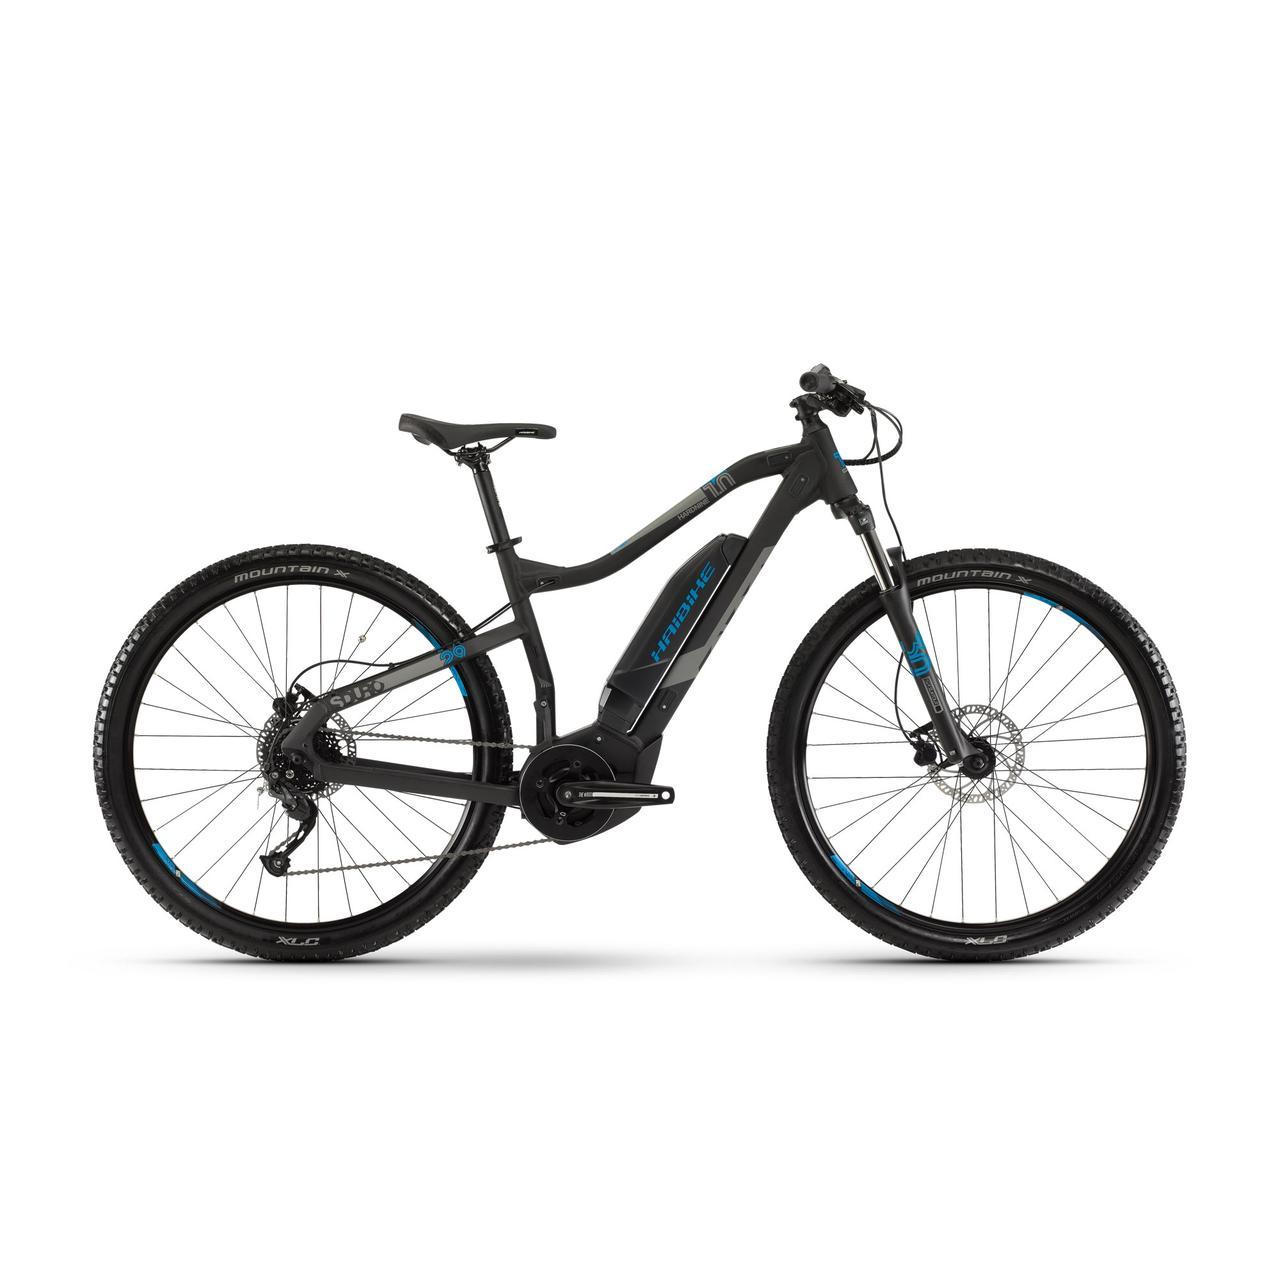 "Электровелосипед Haibike SDURO HardNine 1.0 400Wh 9 s. Altus19 HB YCS 29"", рама XL, черно-серо-синий матовый, 2019"